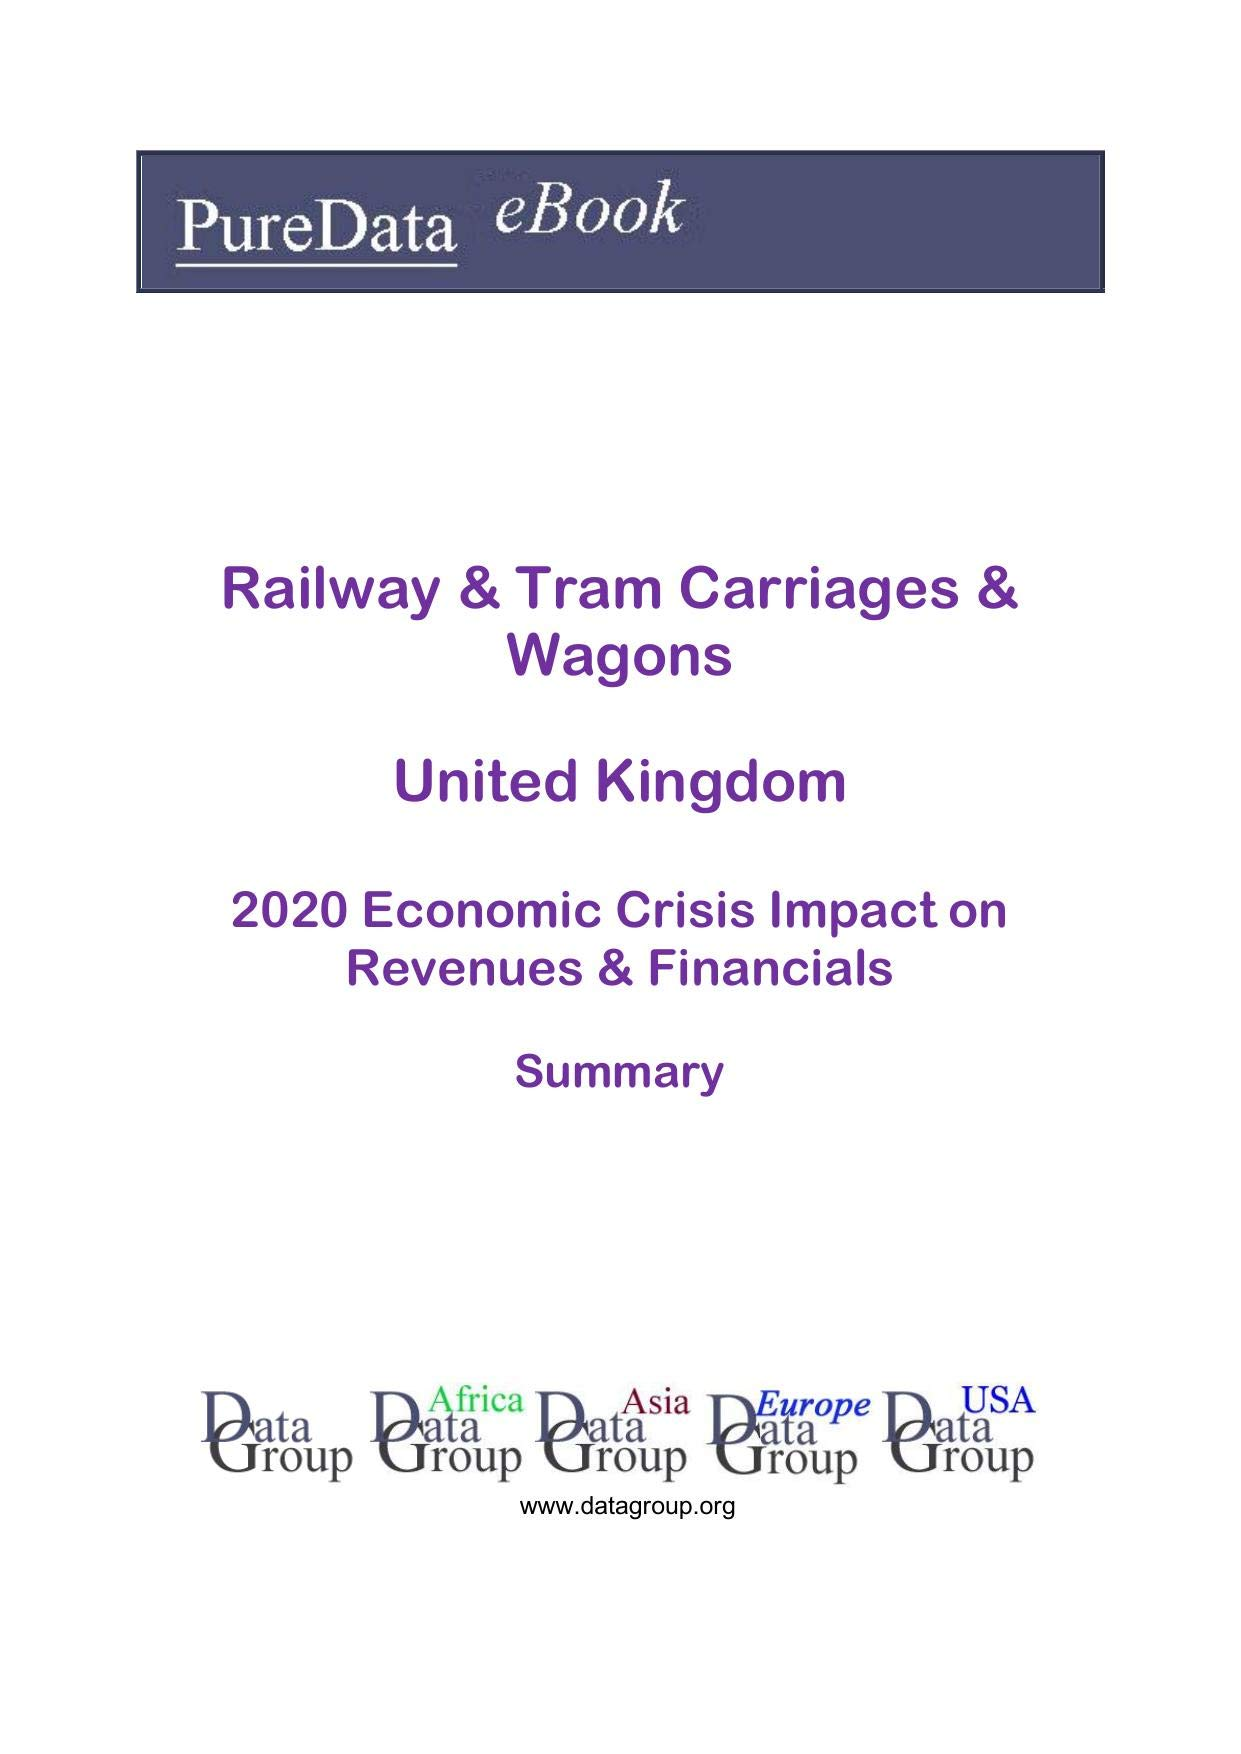 Railway & Tram Carriages & Wagons United Kingdom Summary: 2020 Economic Crisis Impact on Revenues & Financials